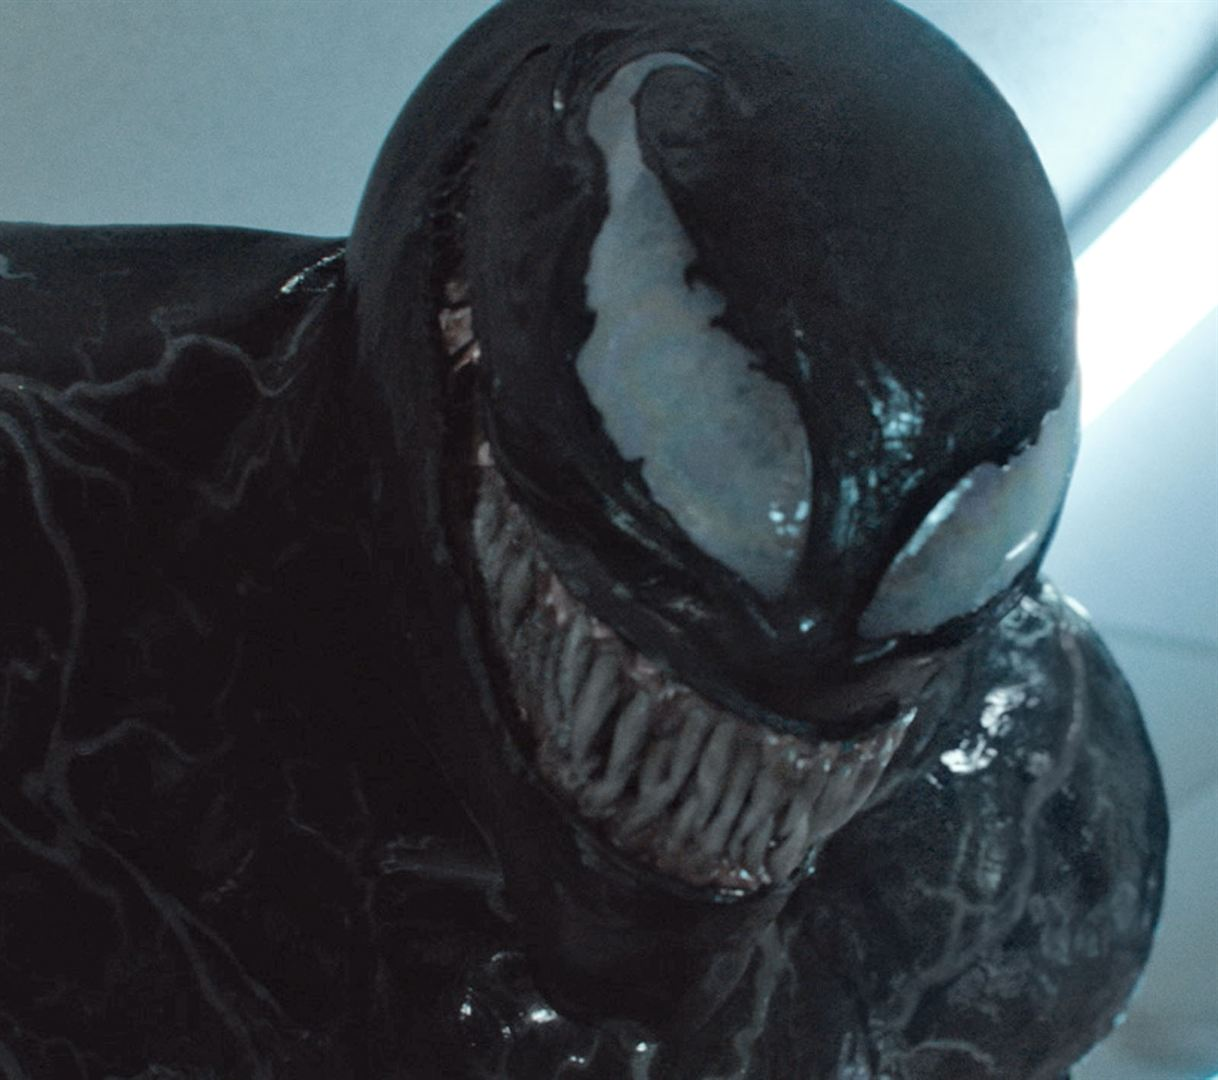 Venom Zehirli Öfke Filmi